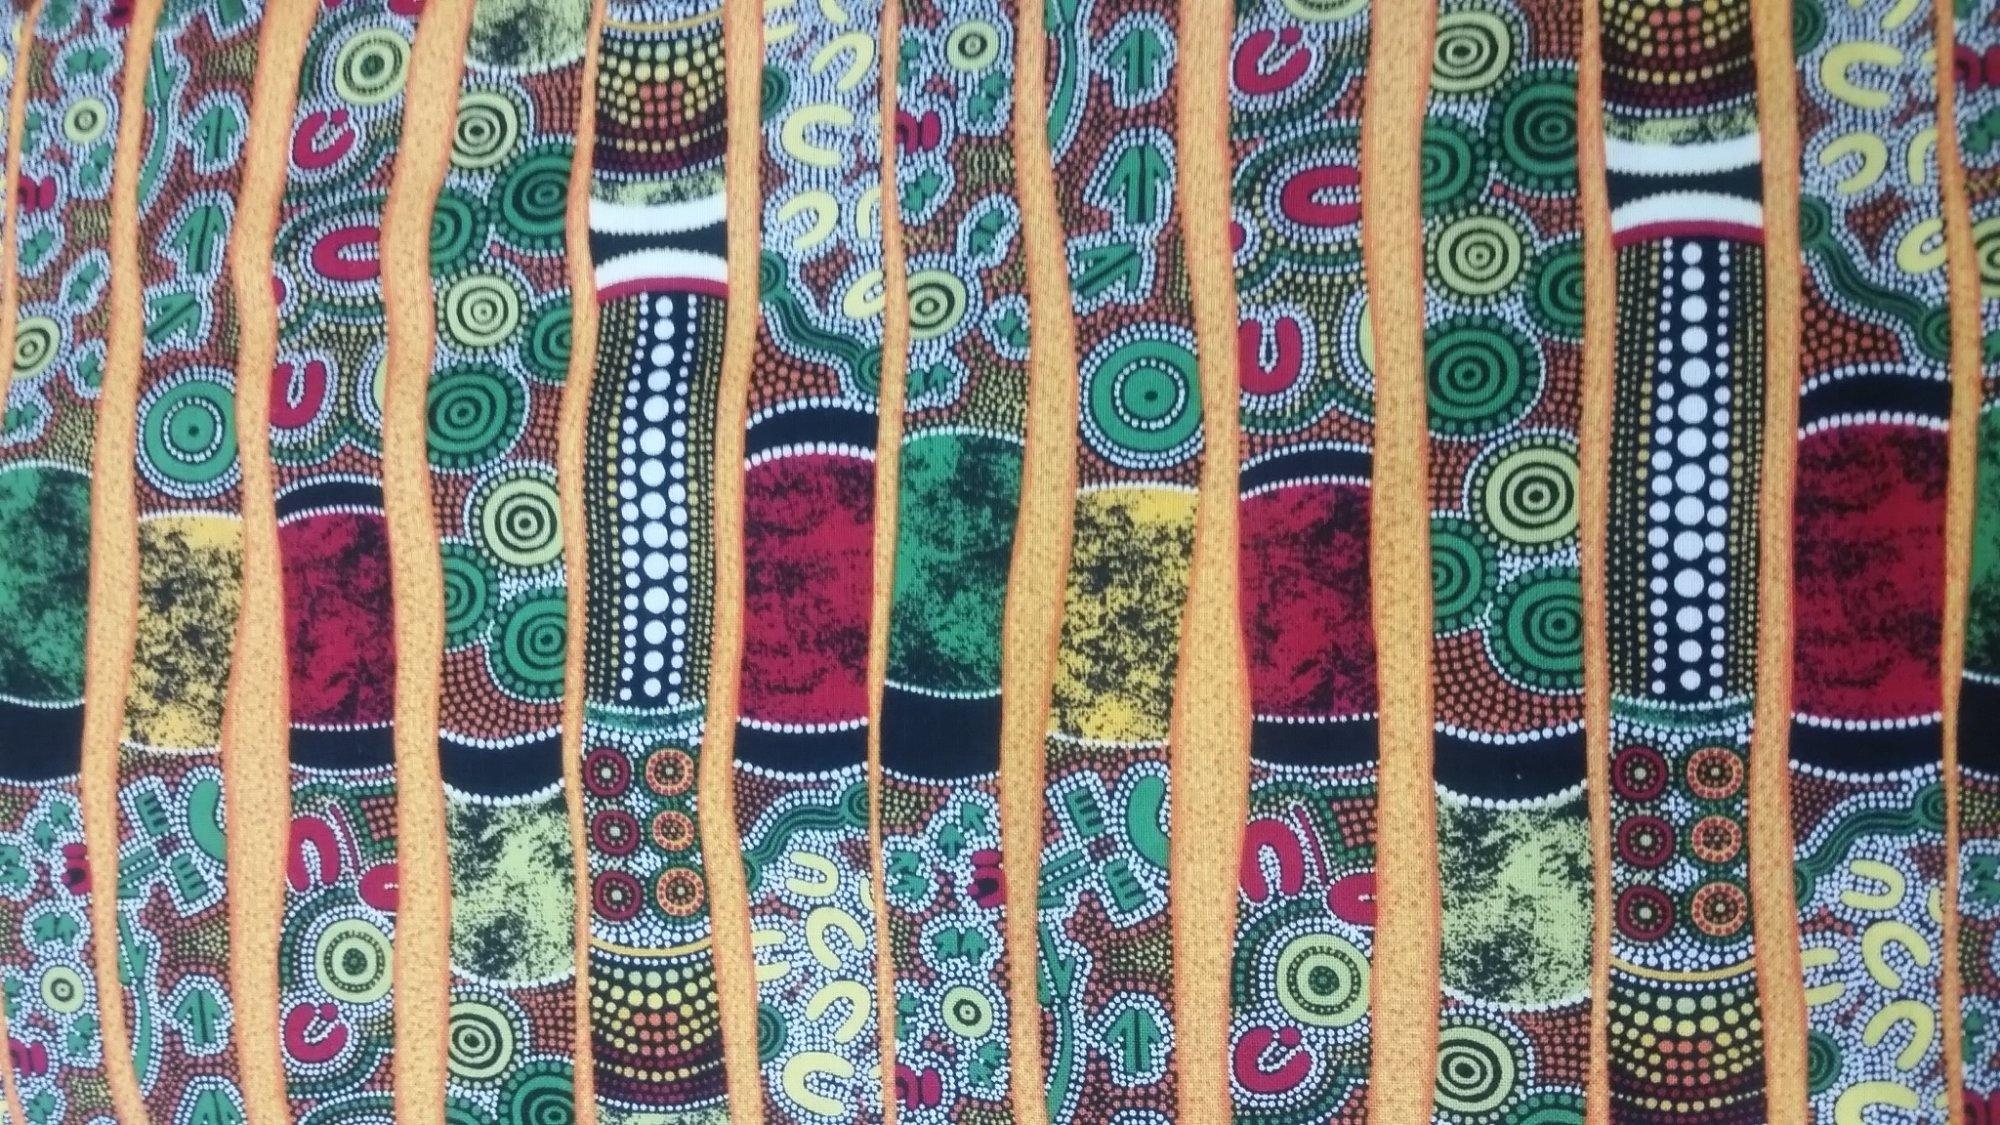 Fabri-Quilt : Paint Brush Studio 120-13501 Goanna Walkabout  Didgeridoos